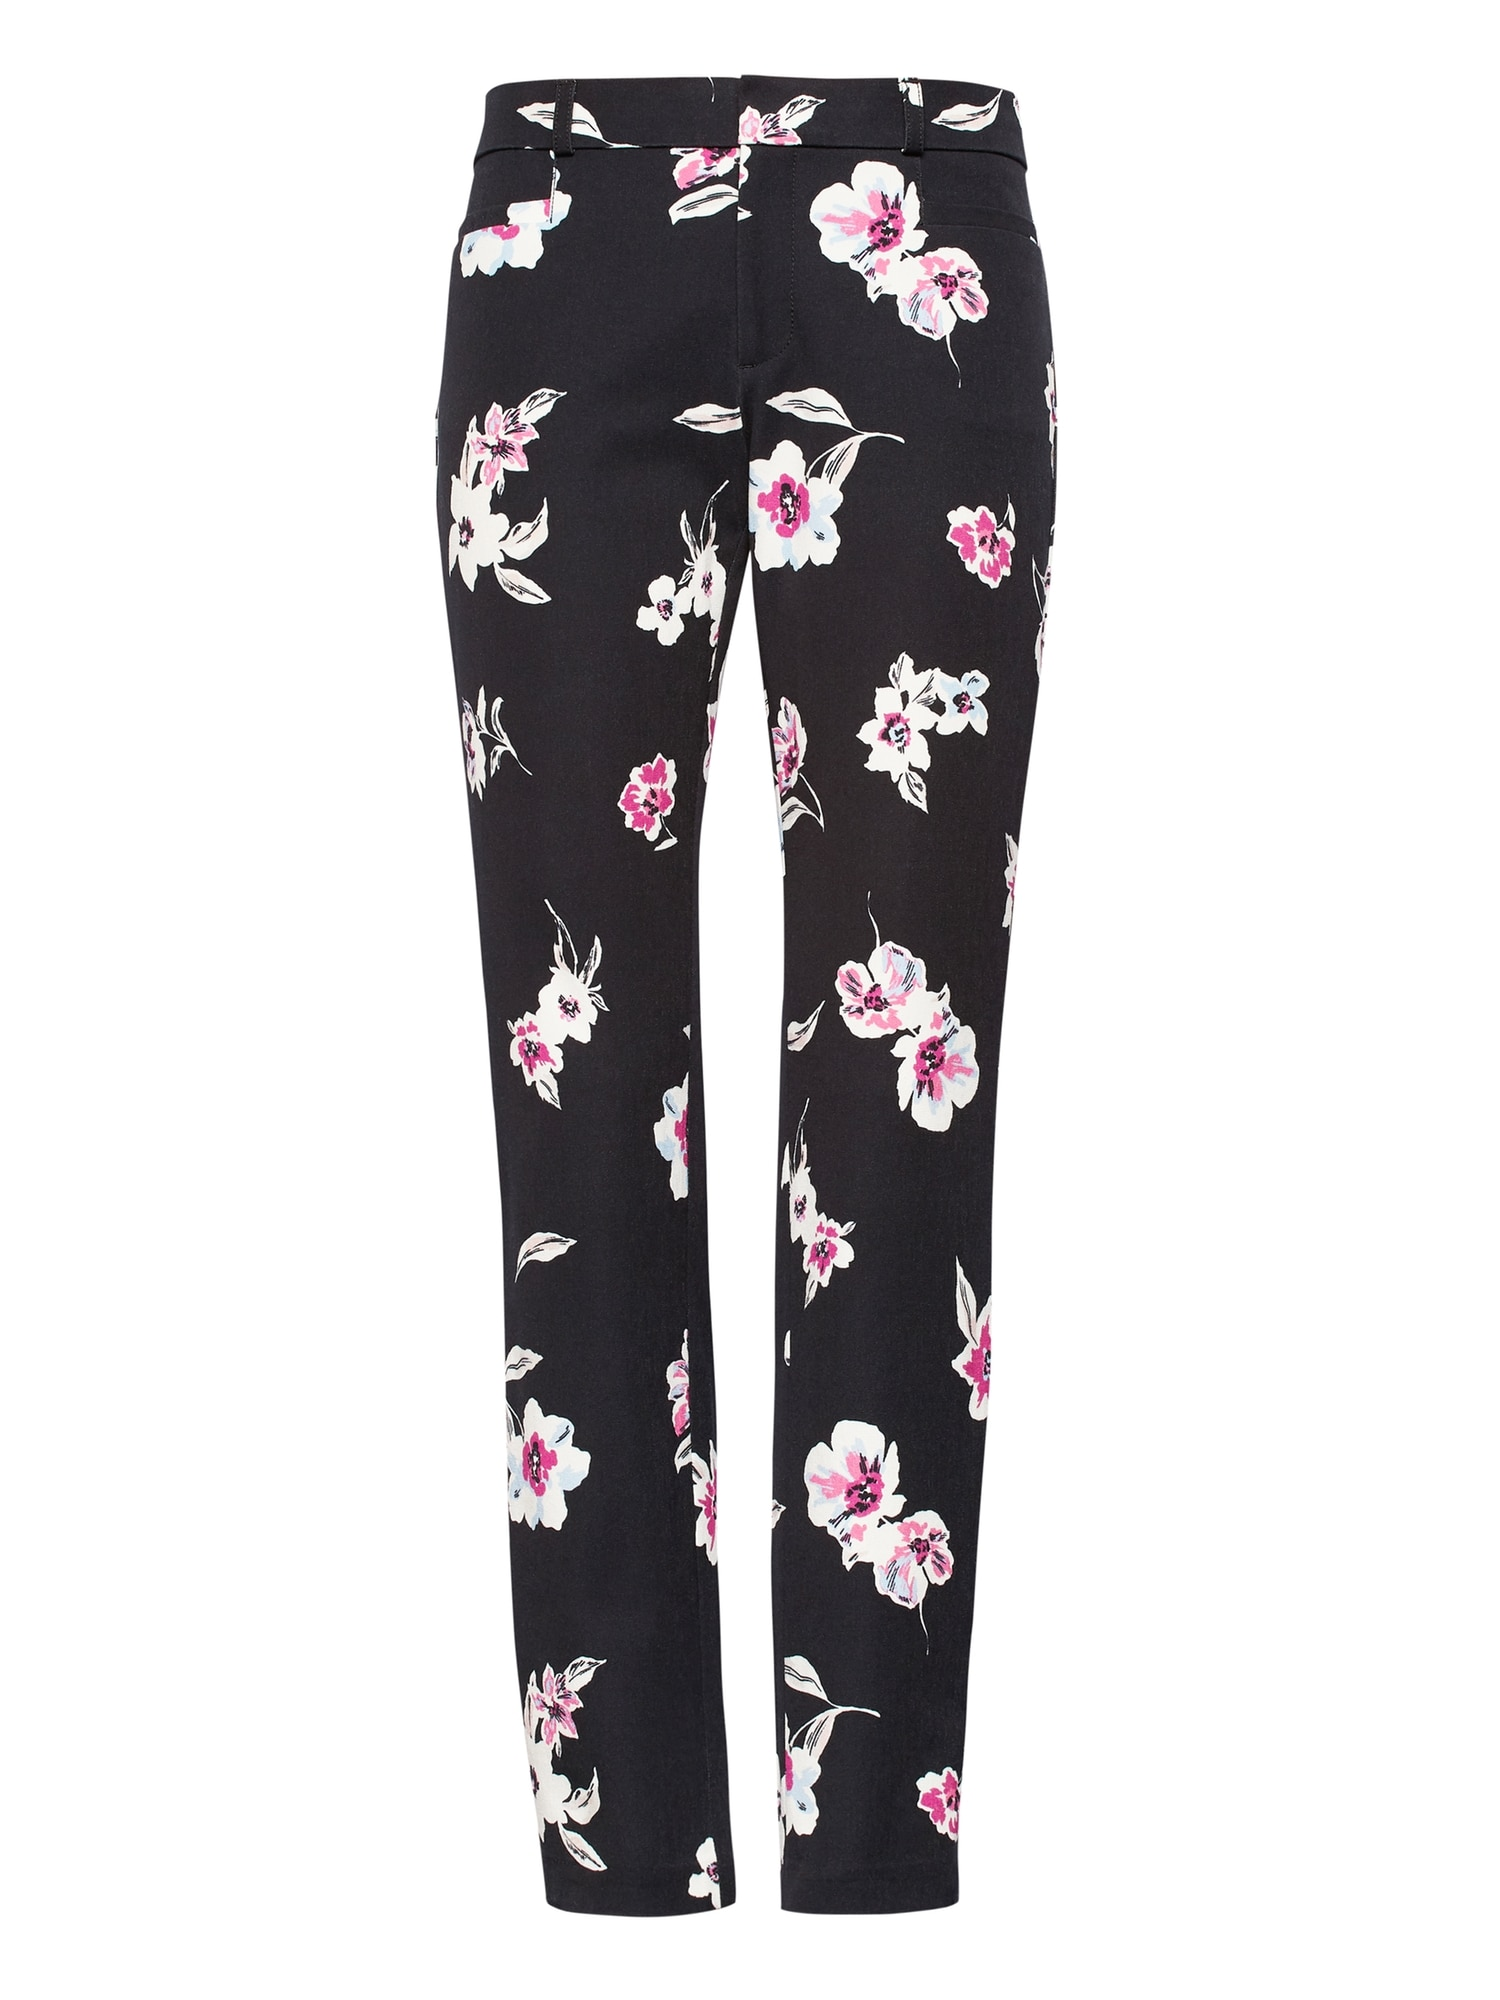 7f707862c6605e Sloan Skinny-Fit Floral Ankle Pant | Banana Republic